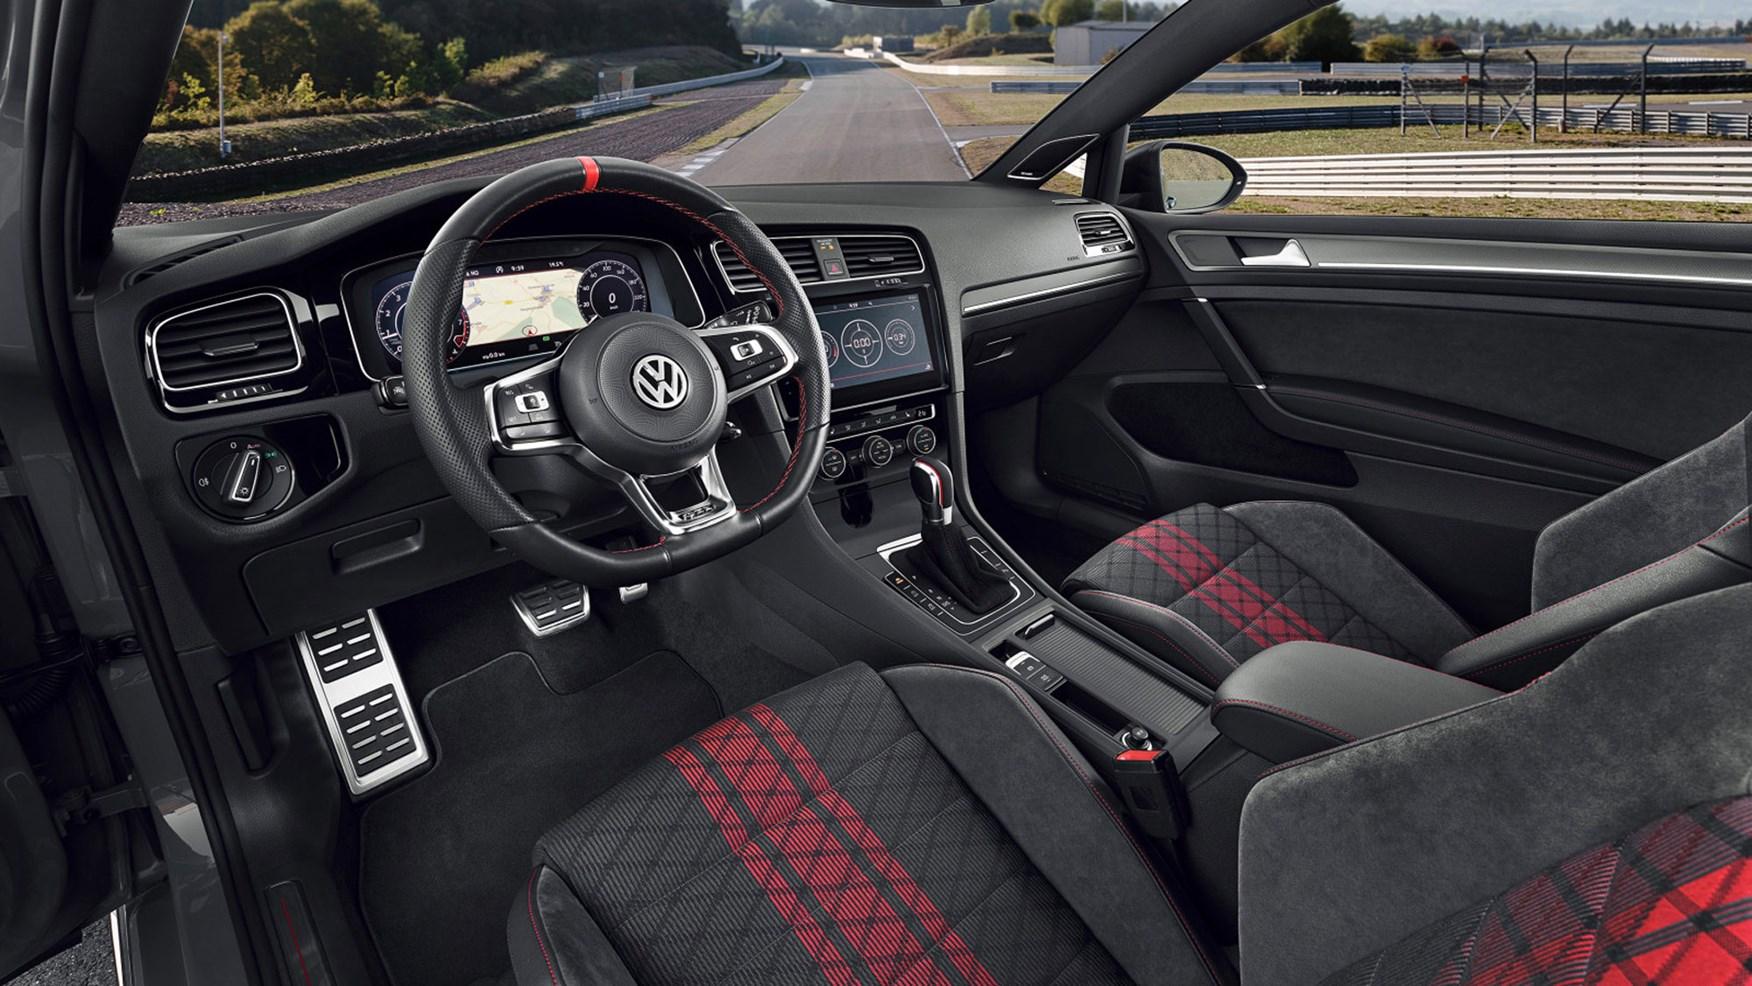 Vw Golf Gti Tcr Review Car Magazine